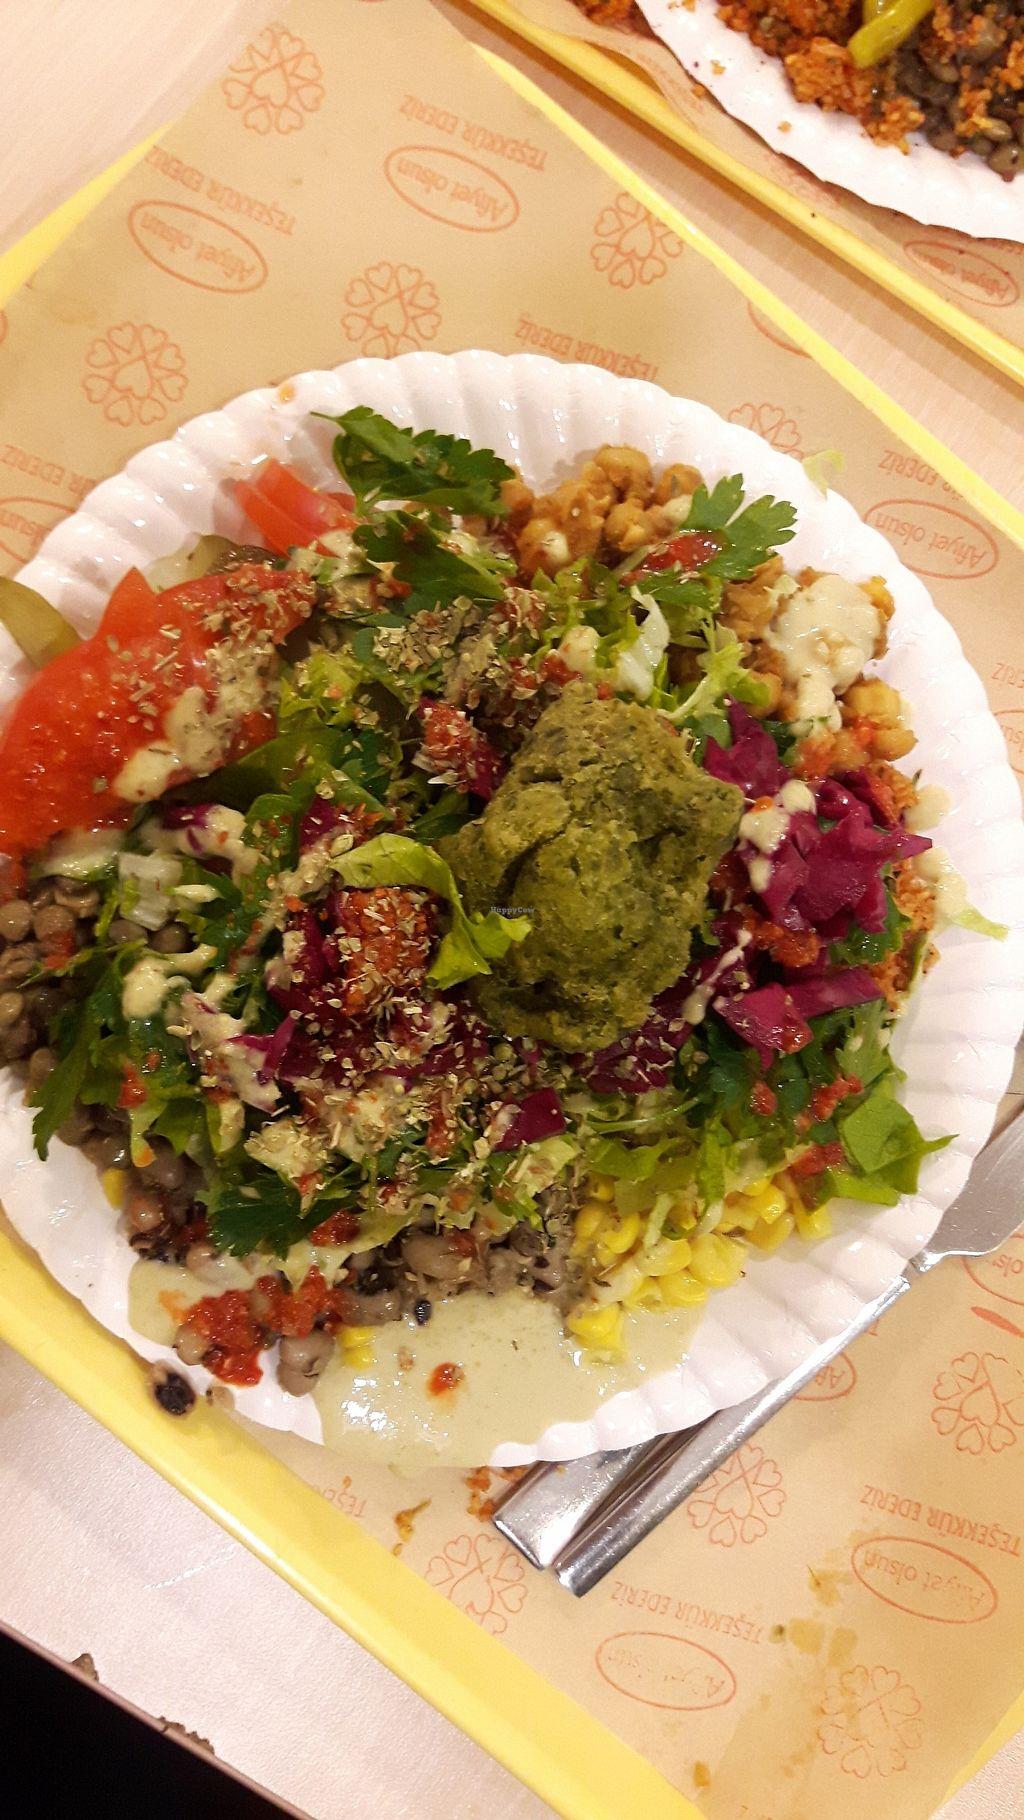 "Photo of Rulo Ezberbozan Lezzetler  by <a href=""/members/profile/CharityBosua"">CharityBosua</a> <br/>I made a messy salad  <br/> April 2, 2018  - <a href='/contact/abuse/image/38525/379883'>Report</a>"